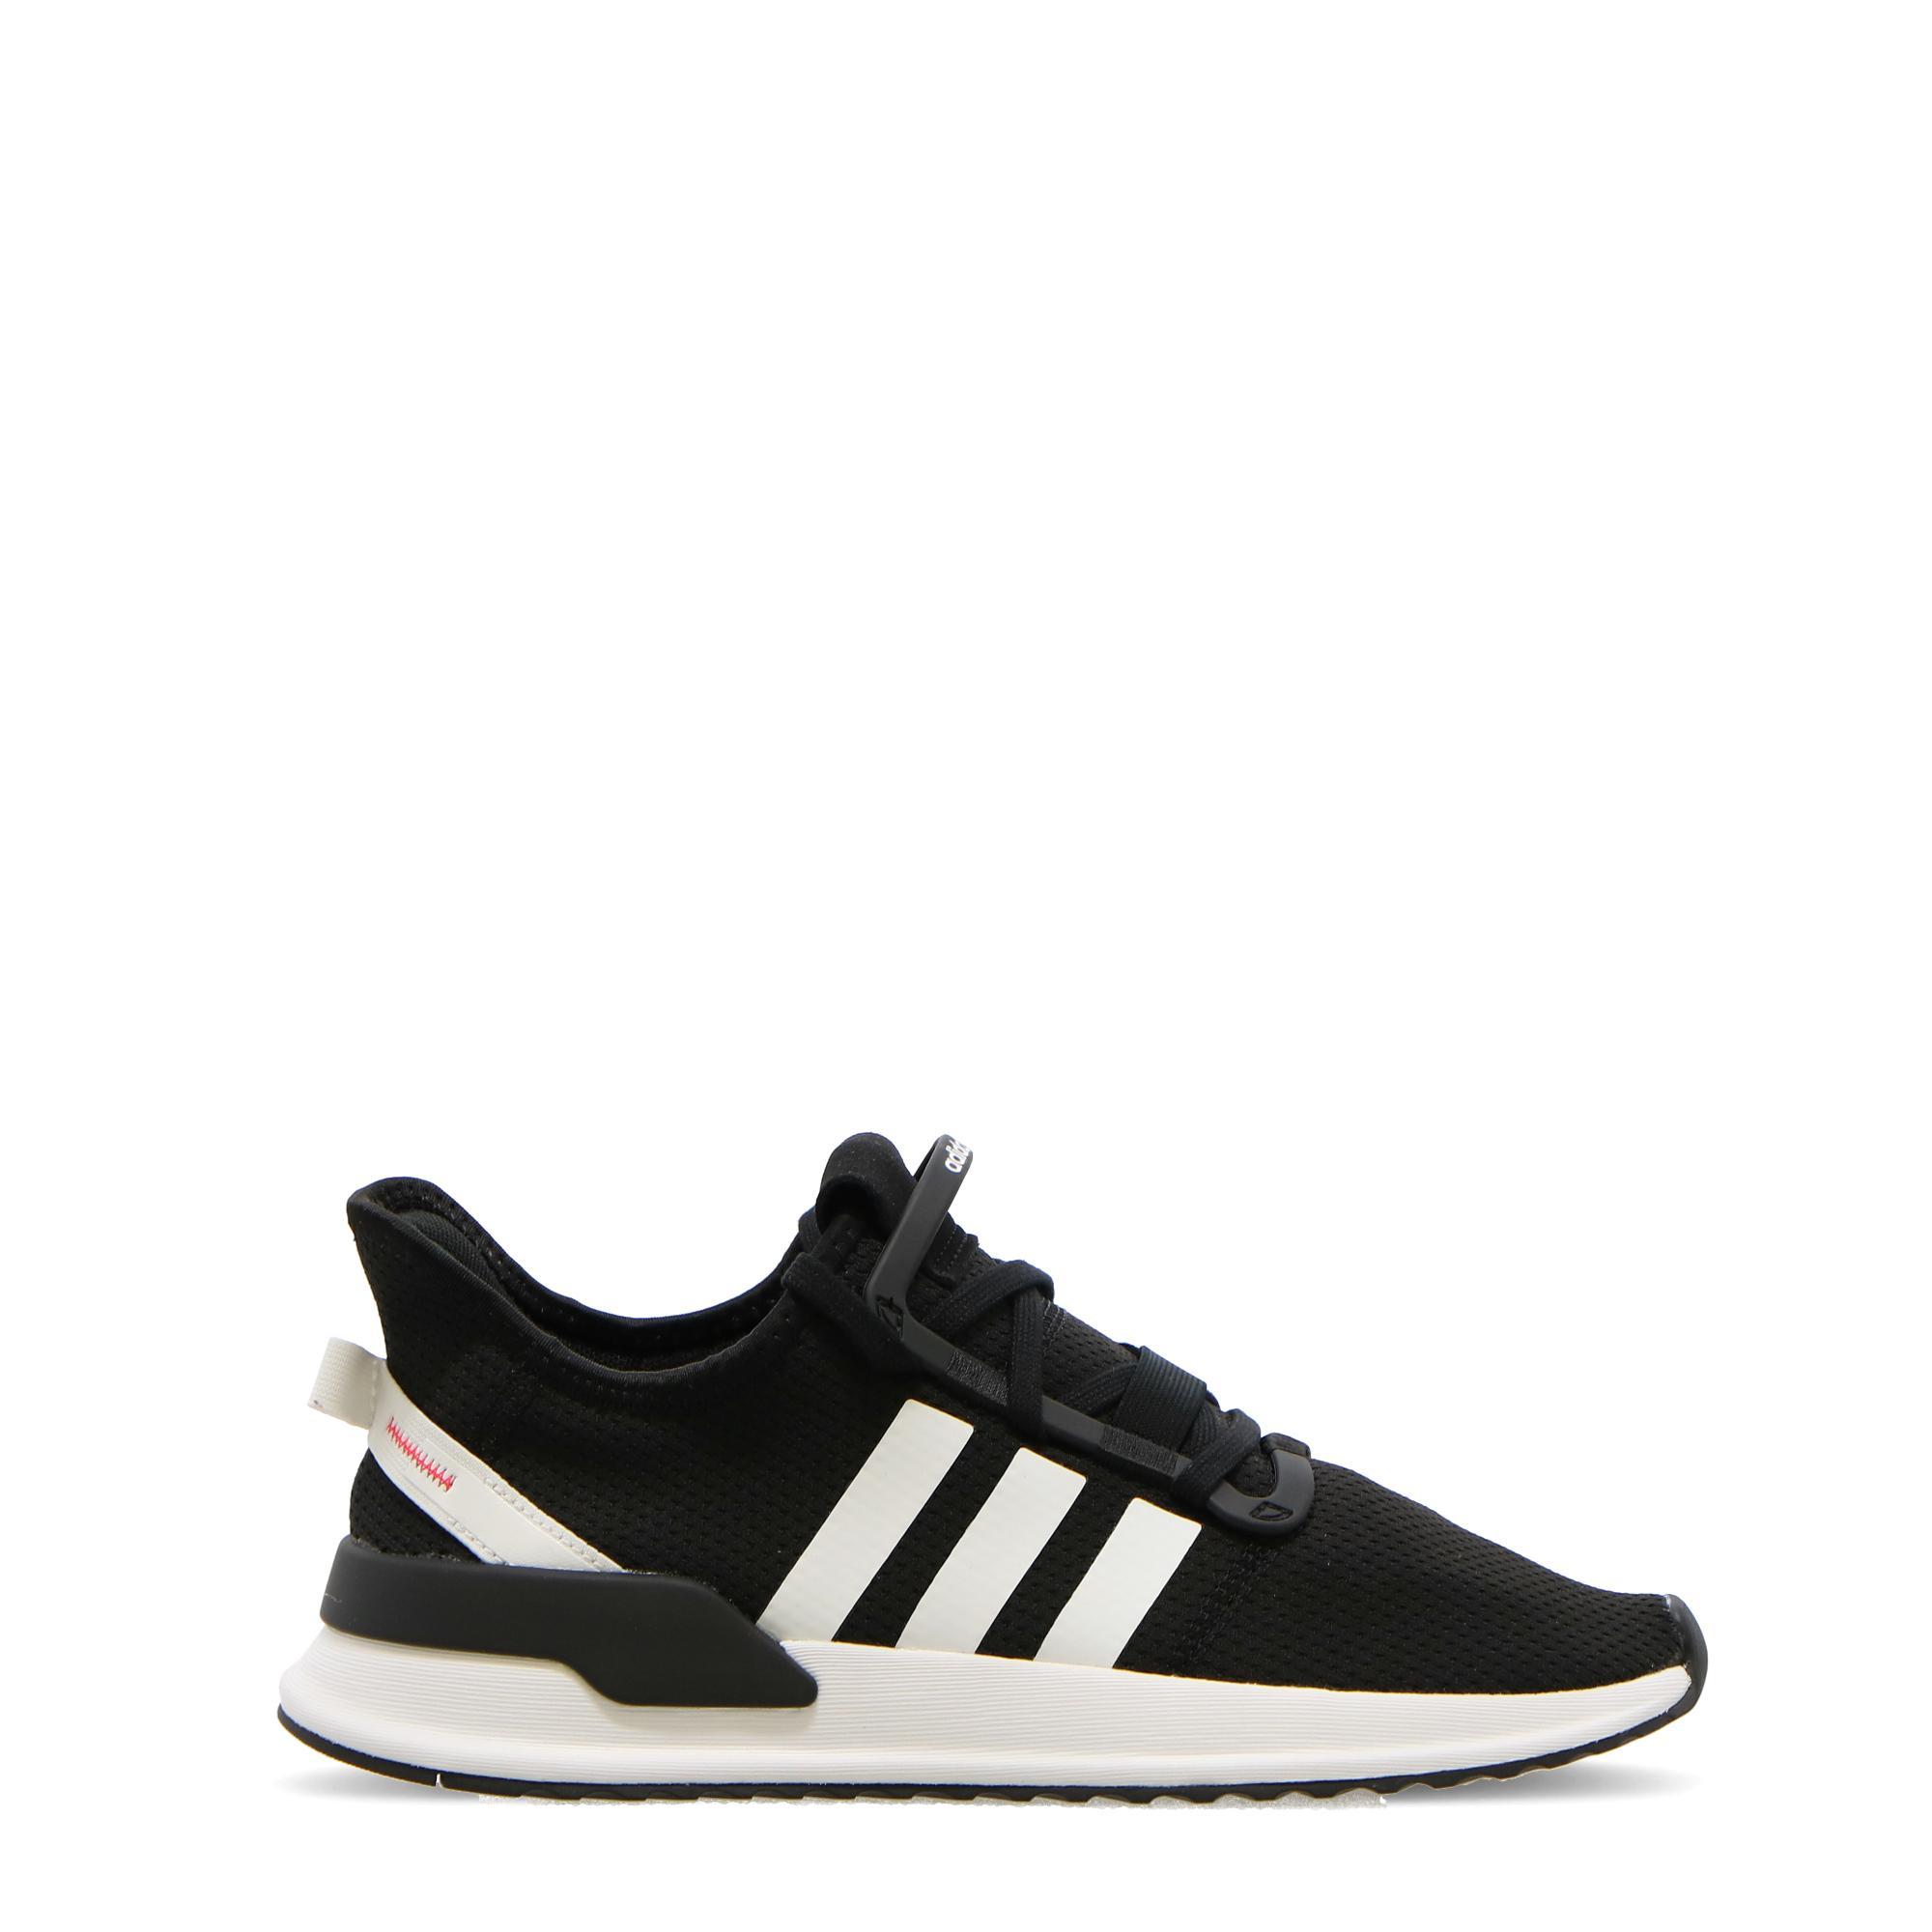 Adidas U_path Run Black white shock red